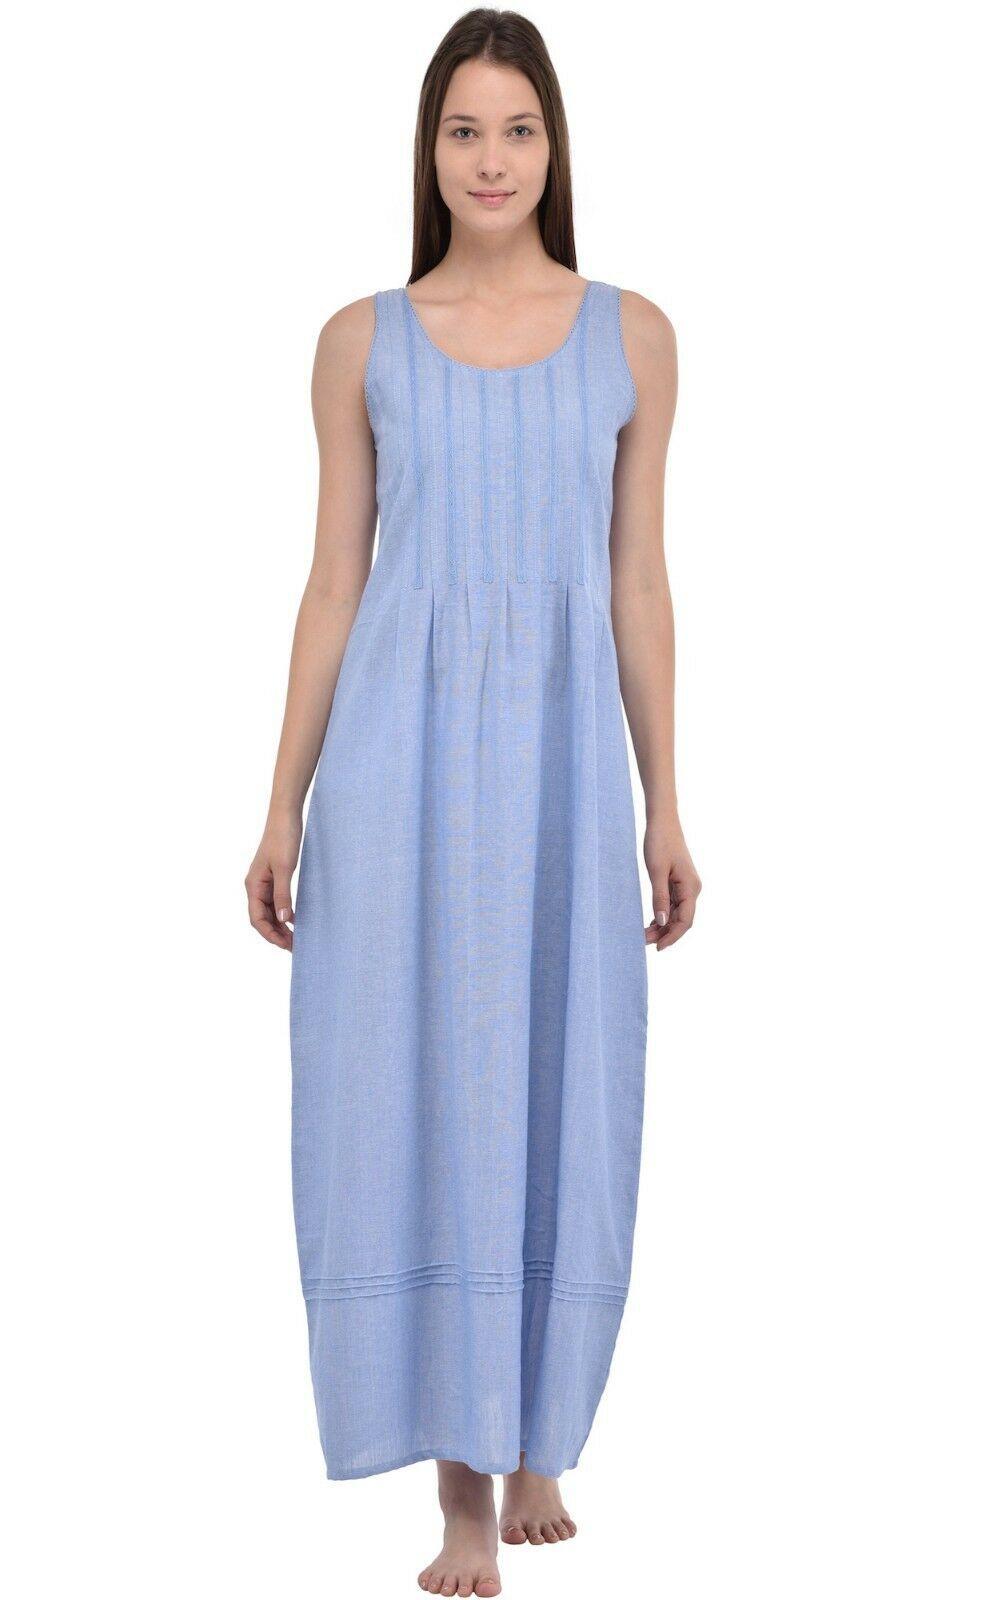 Cotton Lane Chambray Cotton Vintage Nightdress//Dress